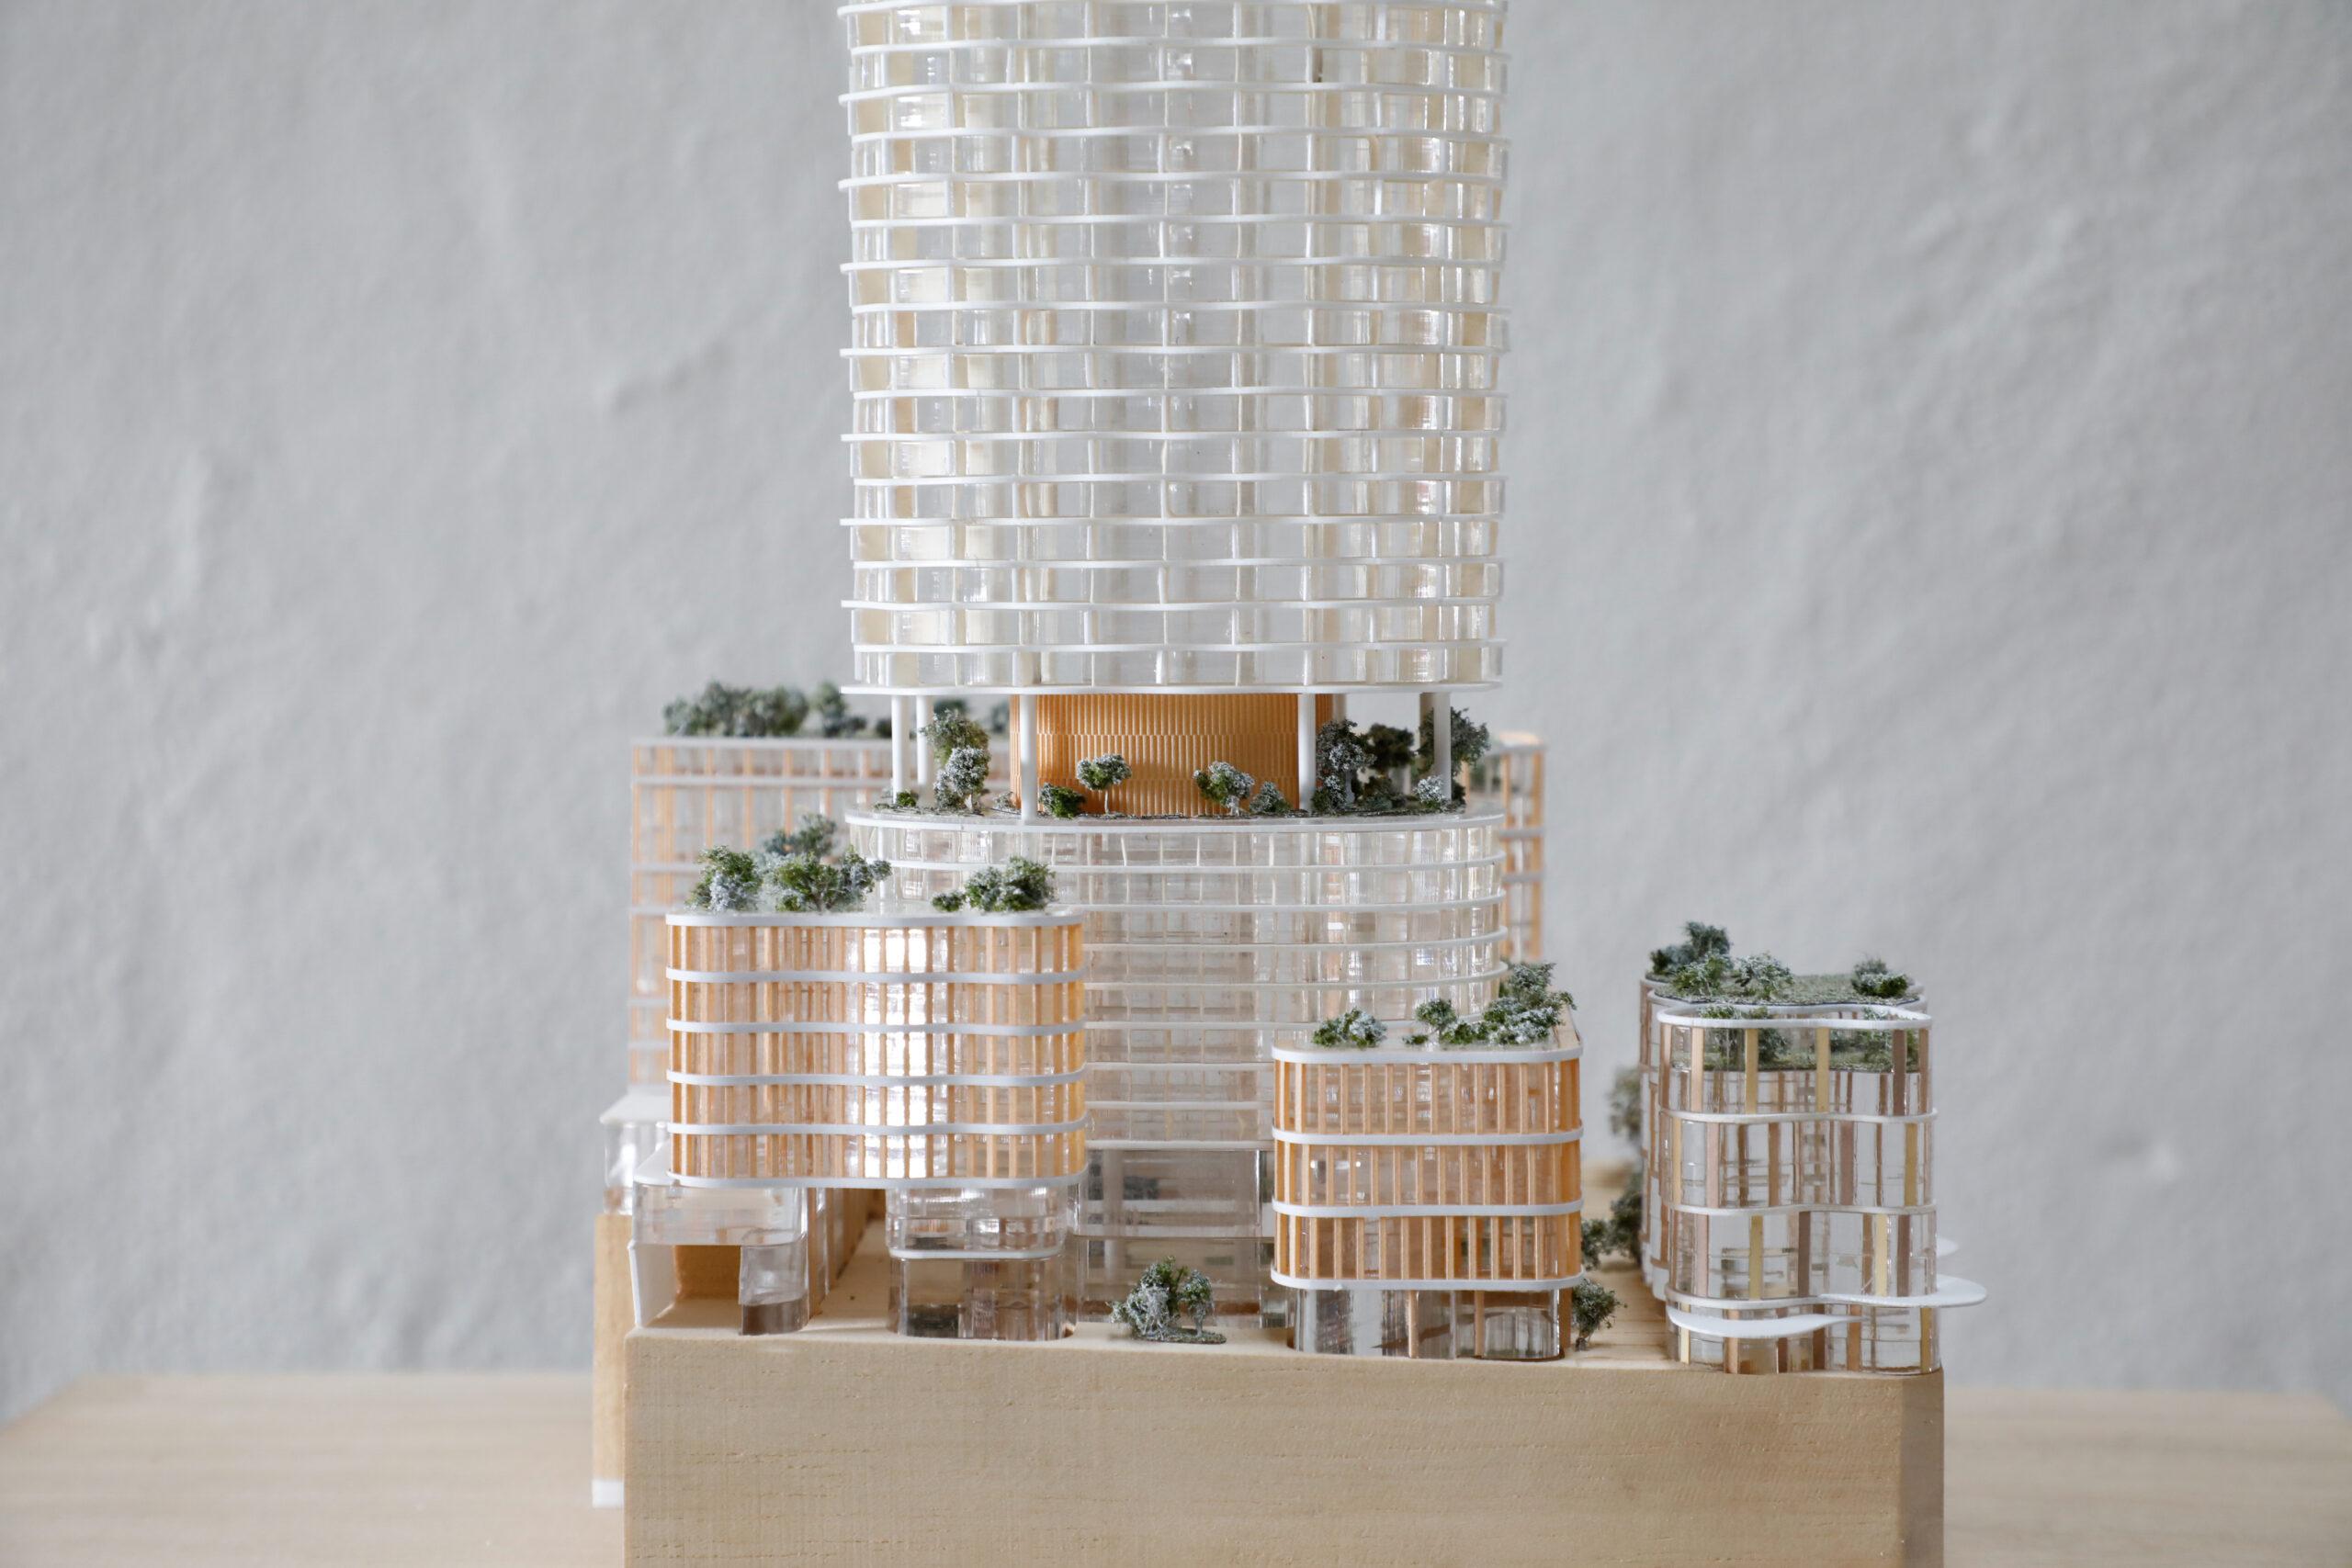 CRONE + Kohn Pedersen Fox Associates – 338 Pitt Street, 2017, 1:500